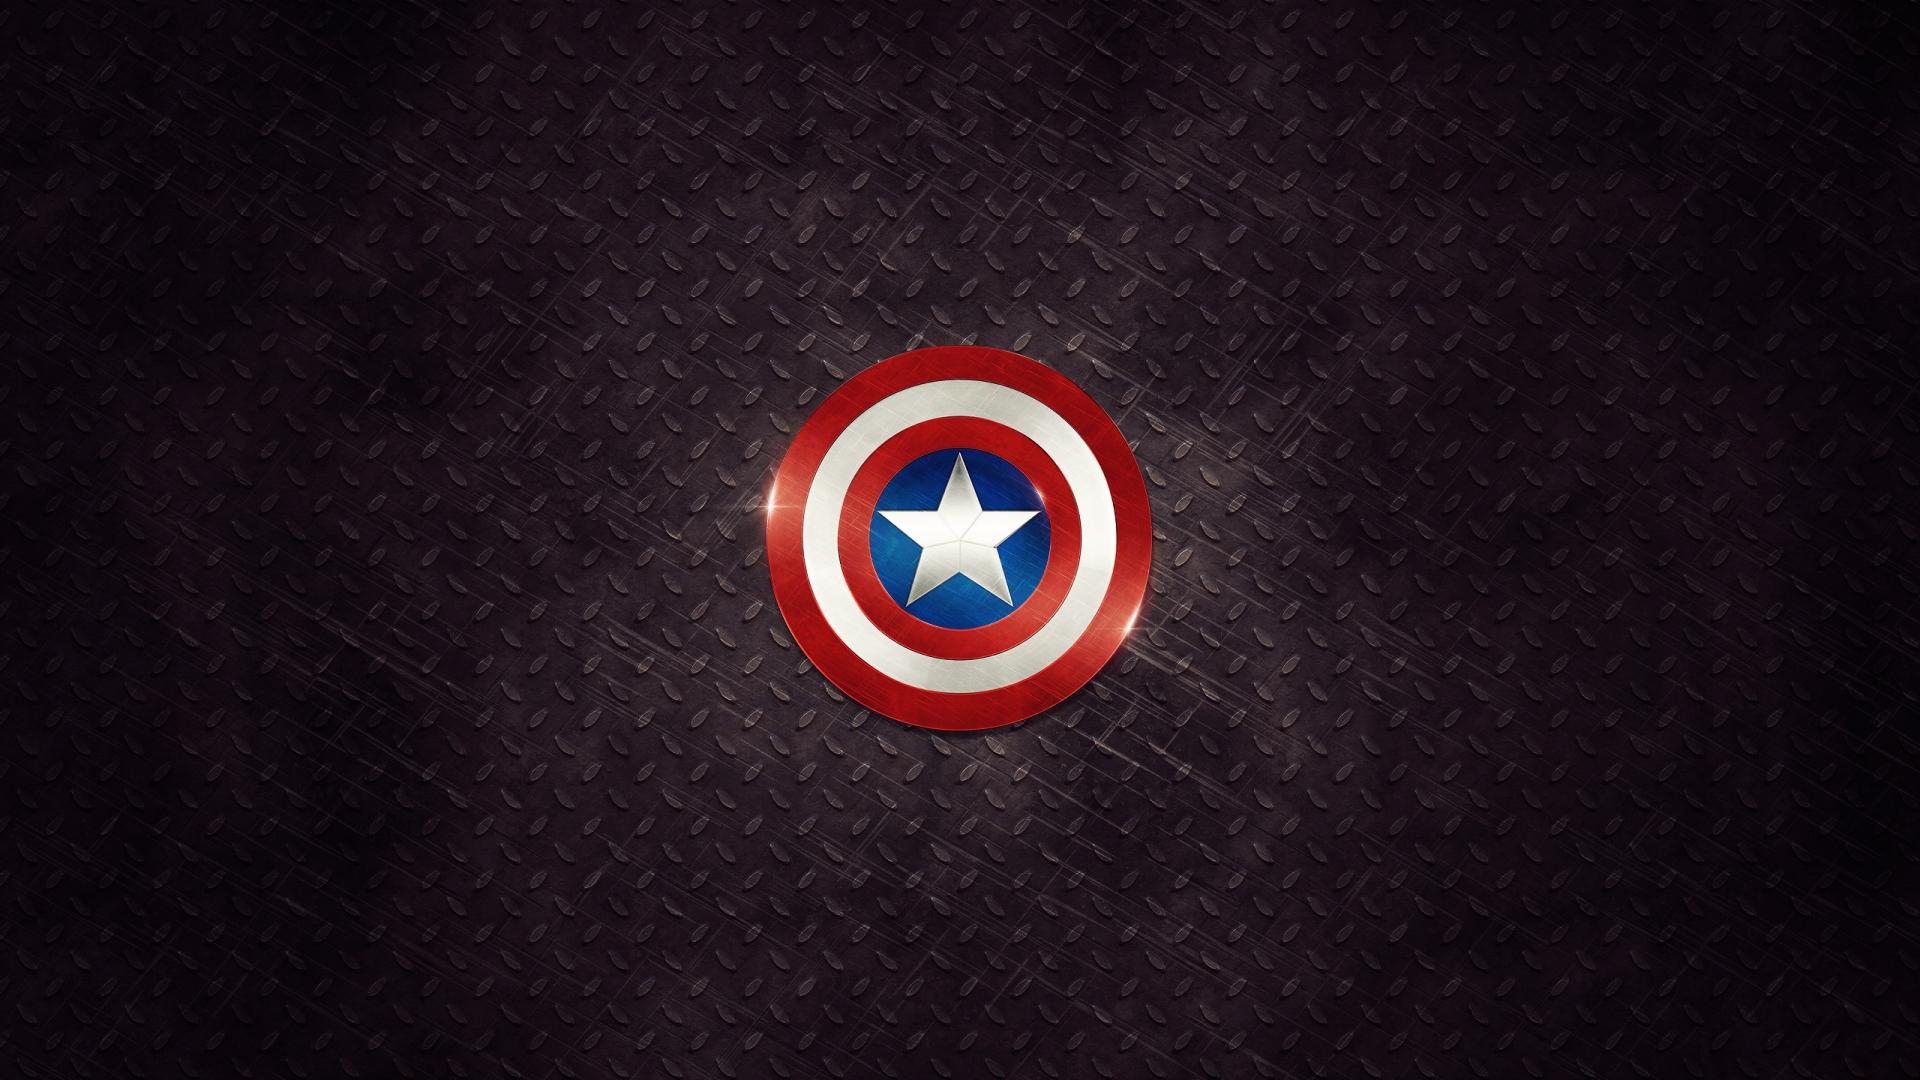 http://1.bp.blogspot.com/-oYqGgObn5eI/UCY8SY6wO6I/AAAAAAAAGVs/jucKPzOXBL8/s0/captain-america-logo-1920x1080-wallpaper.jpg